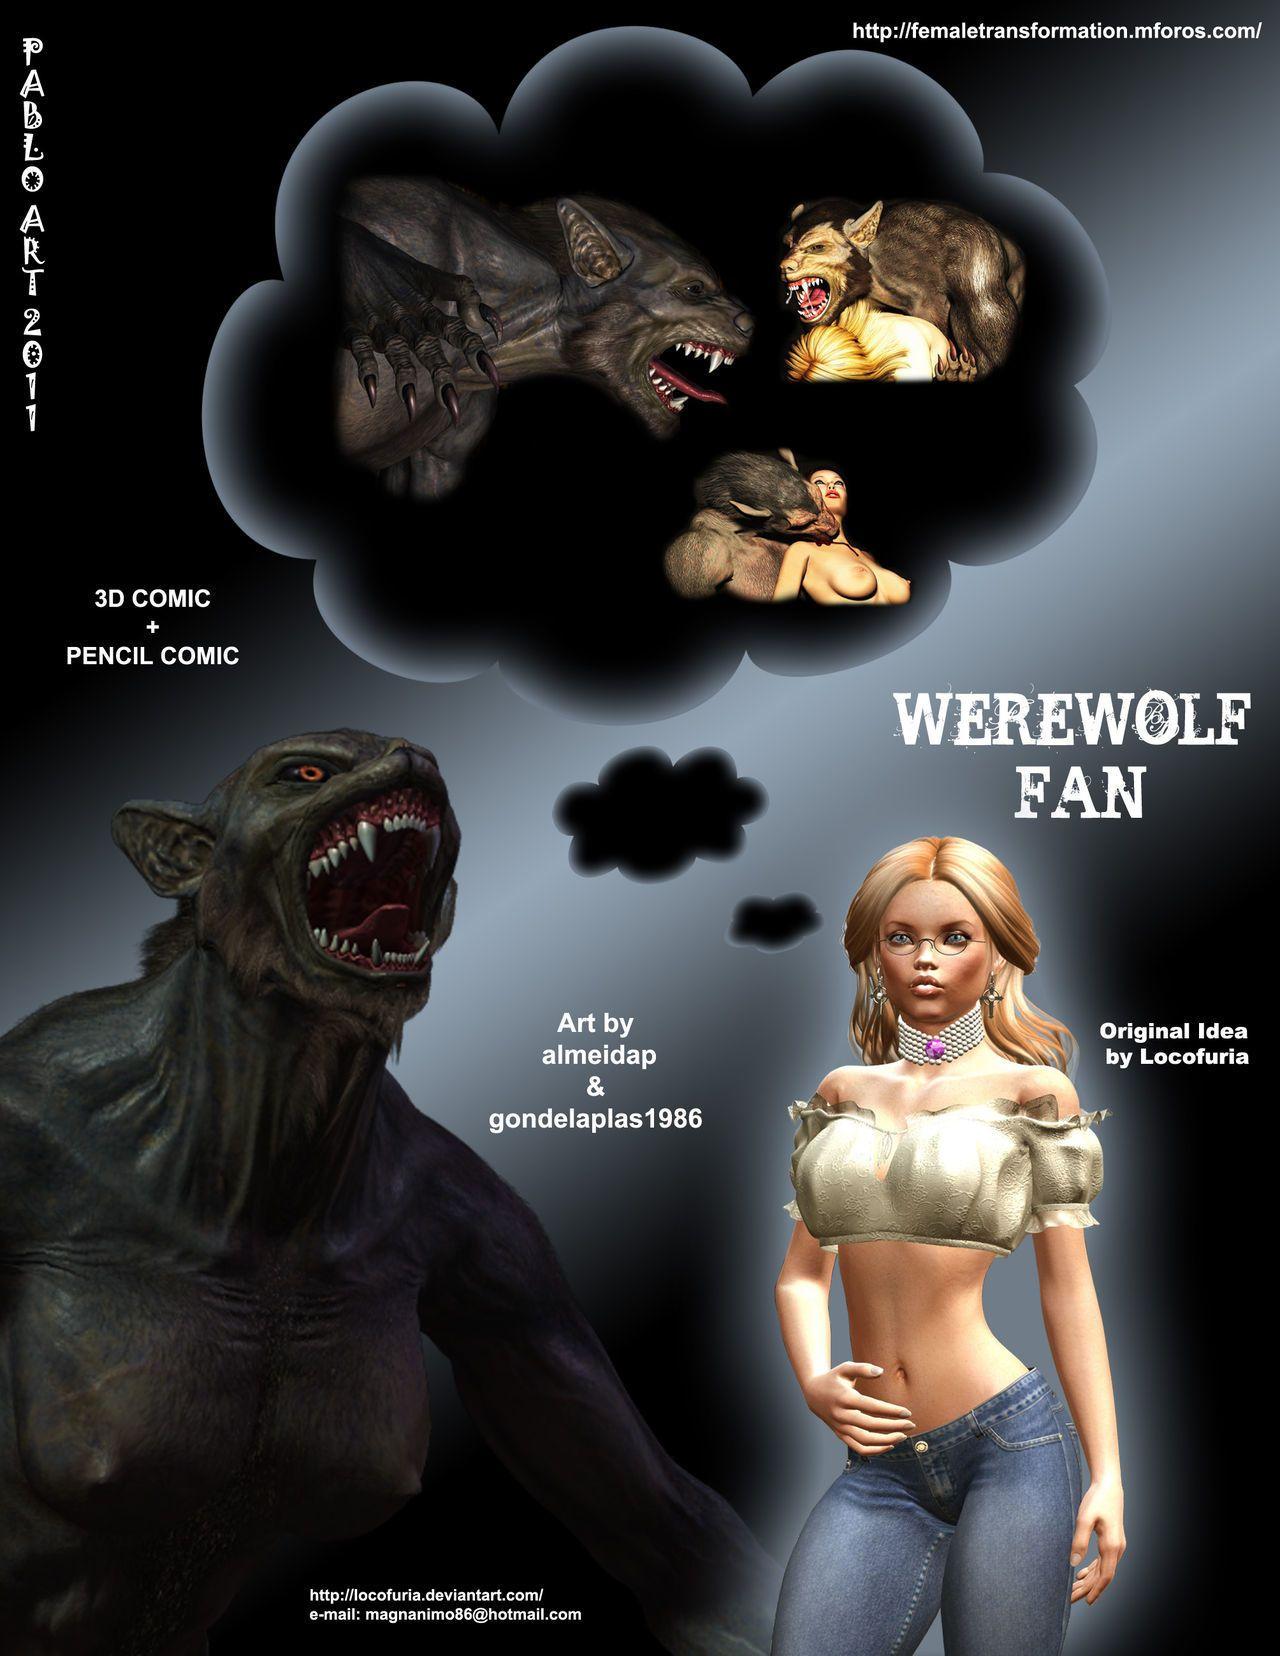 Werewolf porn pics adult movies